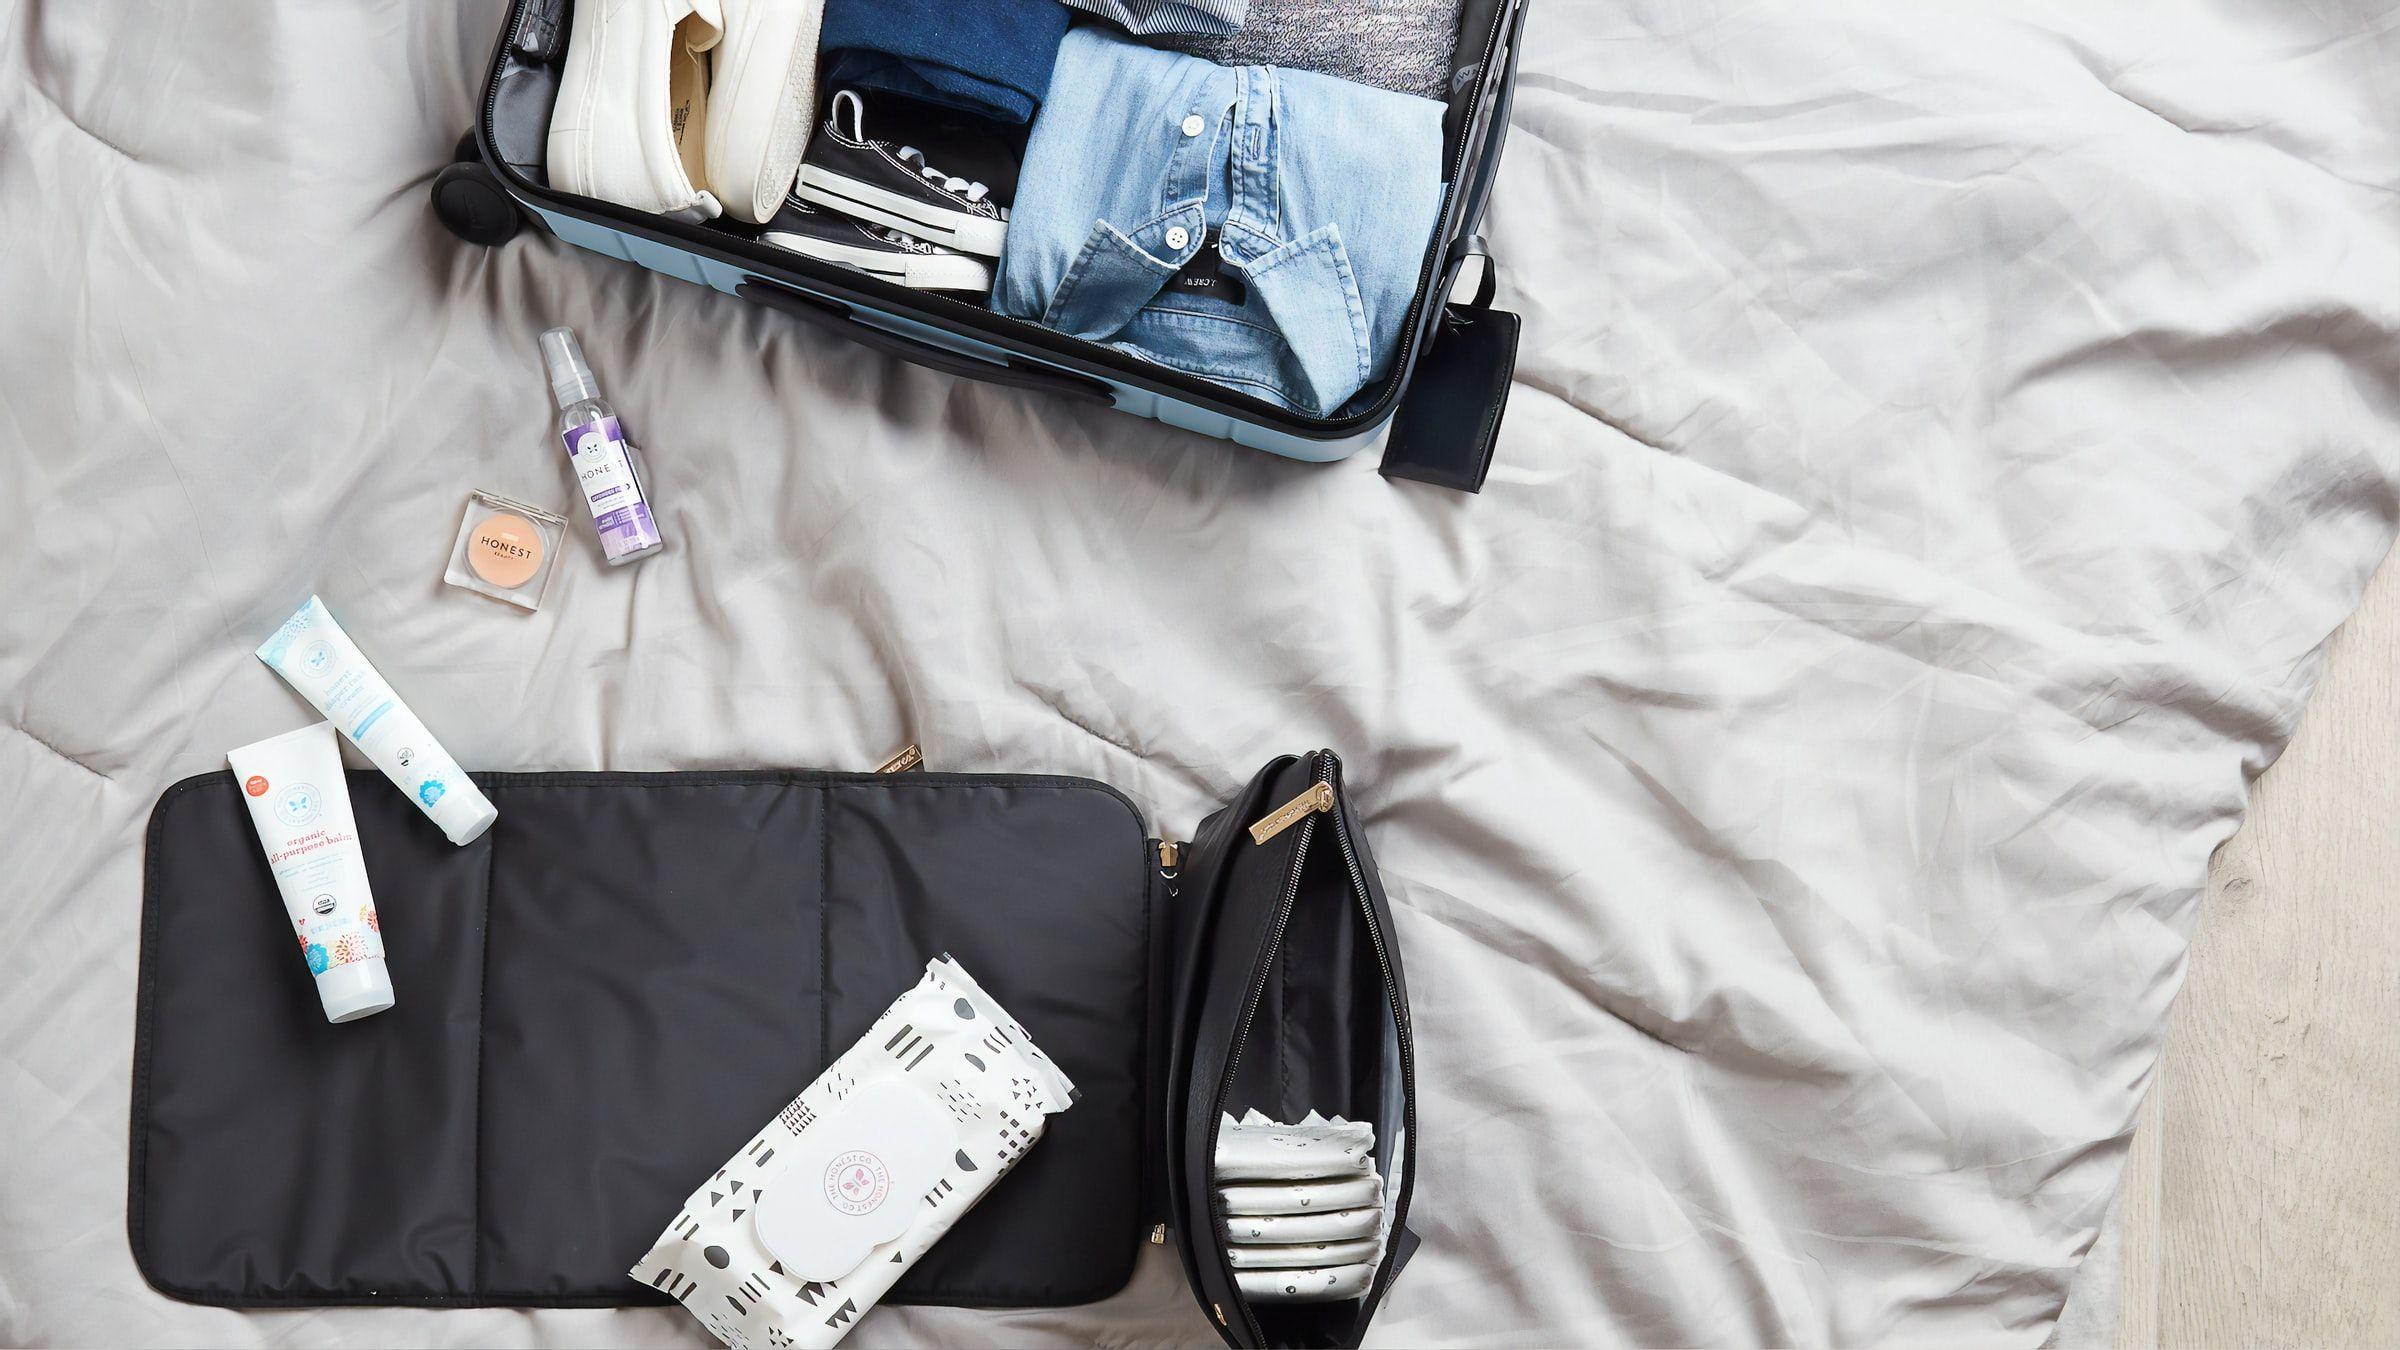 The Minimalist's Hospital Bag Checklist in 2020 Shoe